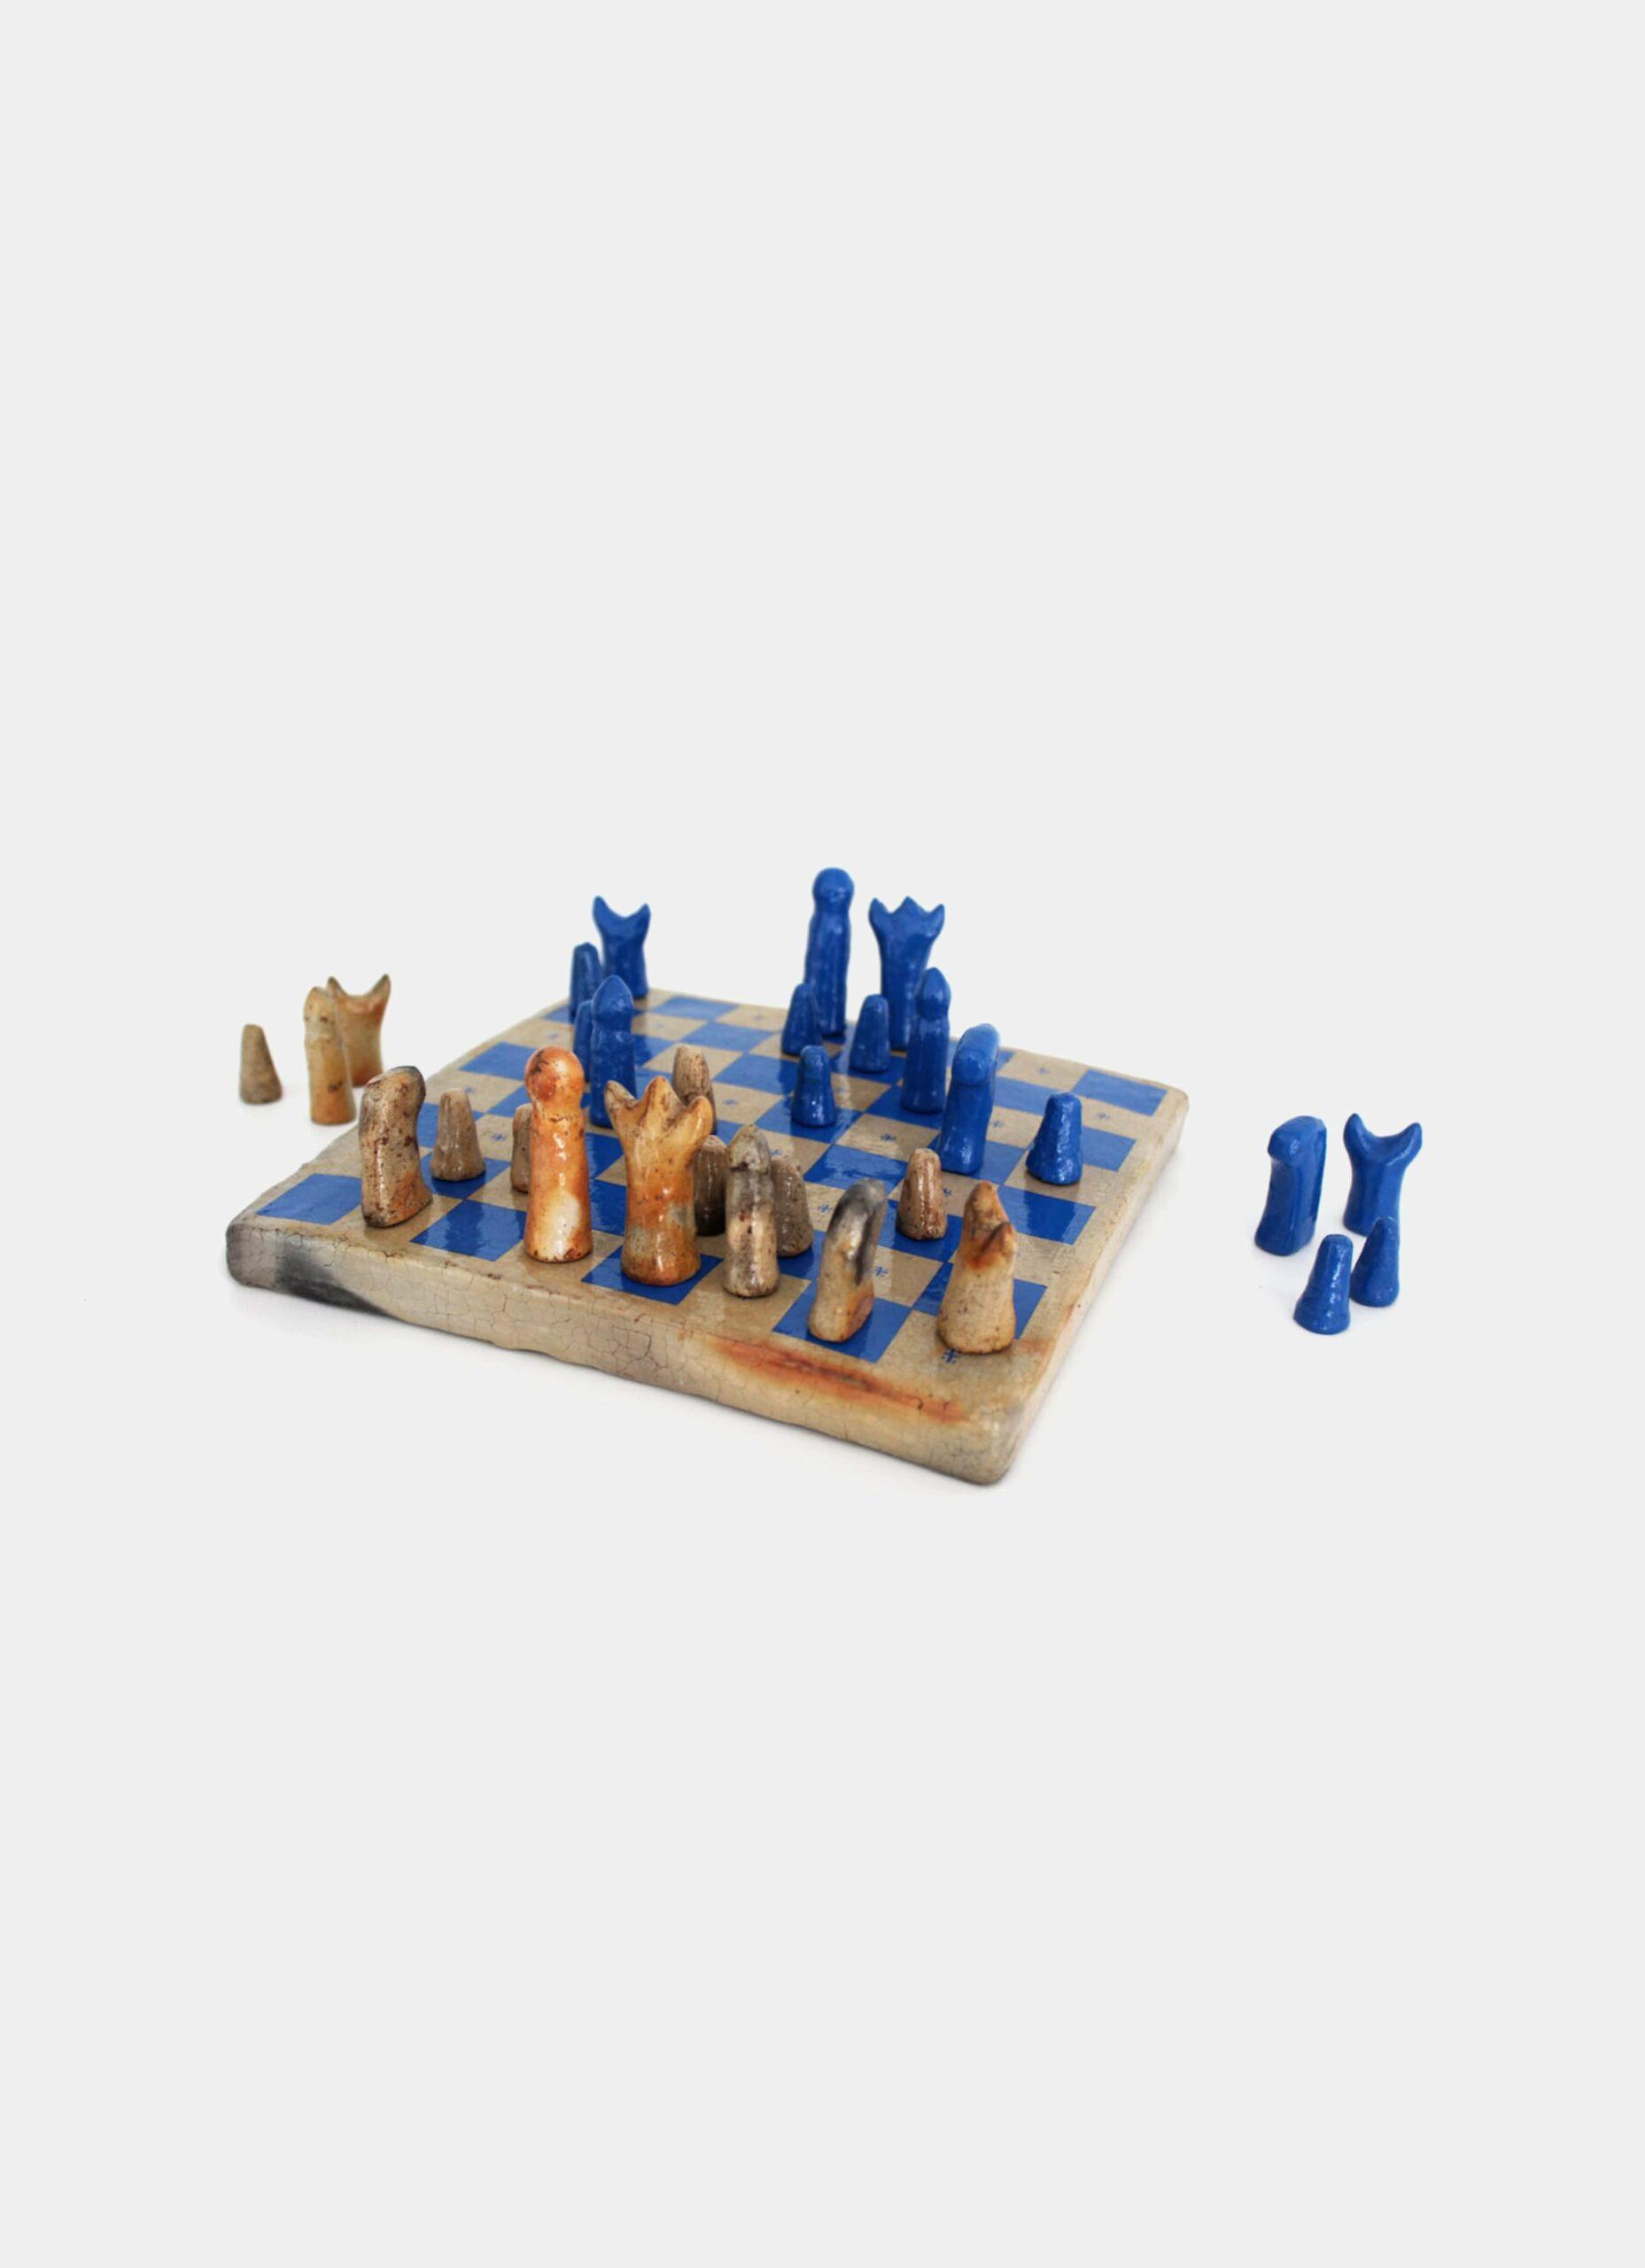 Flayou - Chich-Bich - Stoneware Chess - Special edition - Neon blue